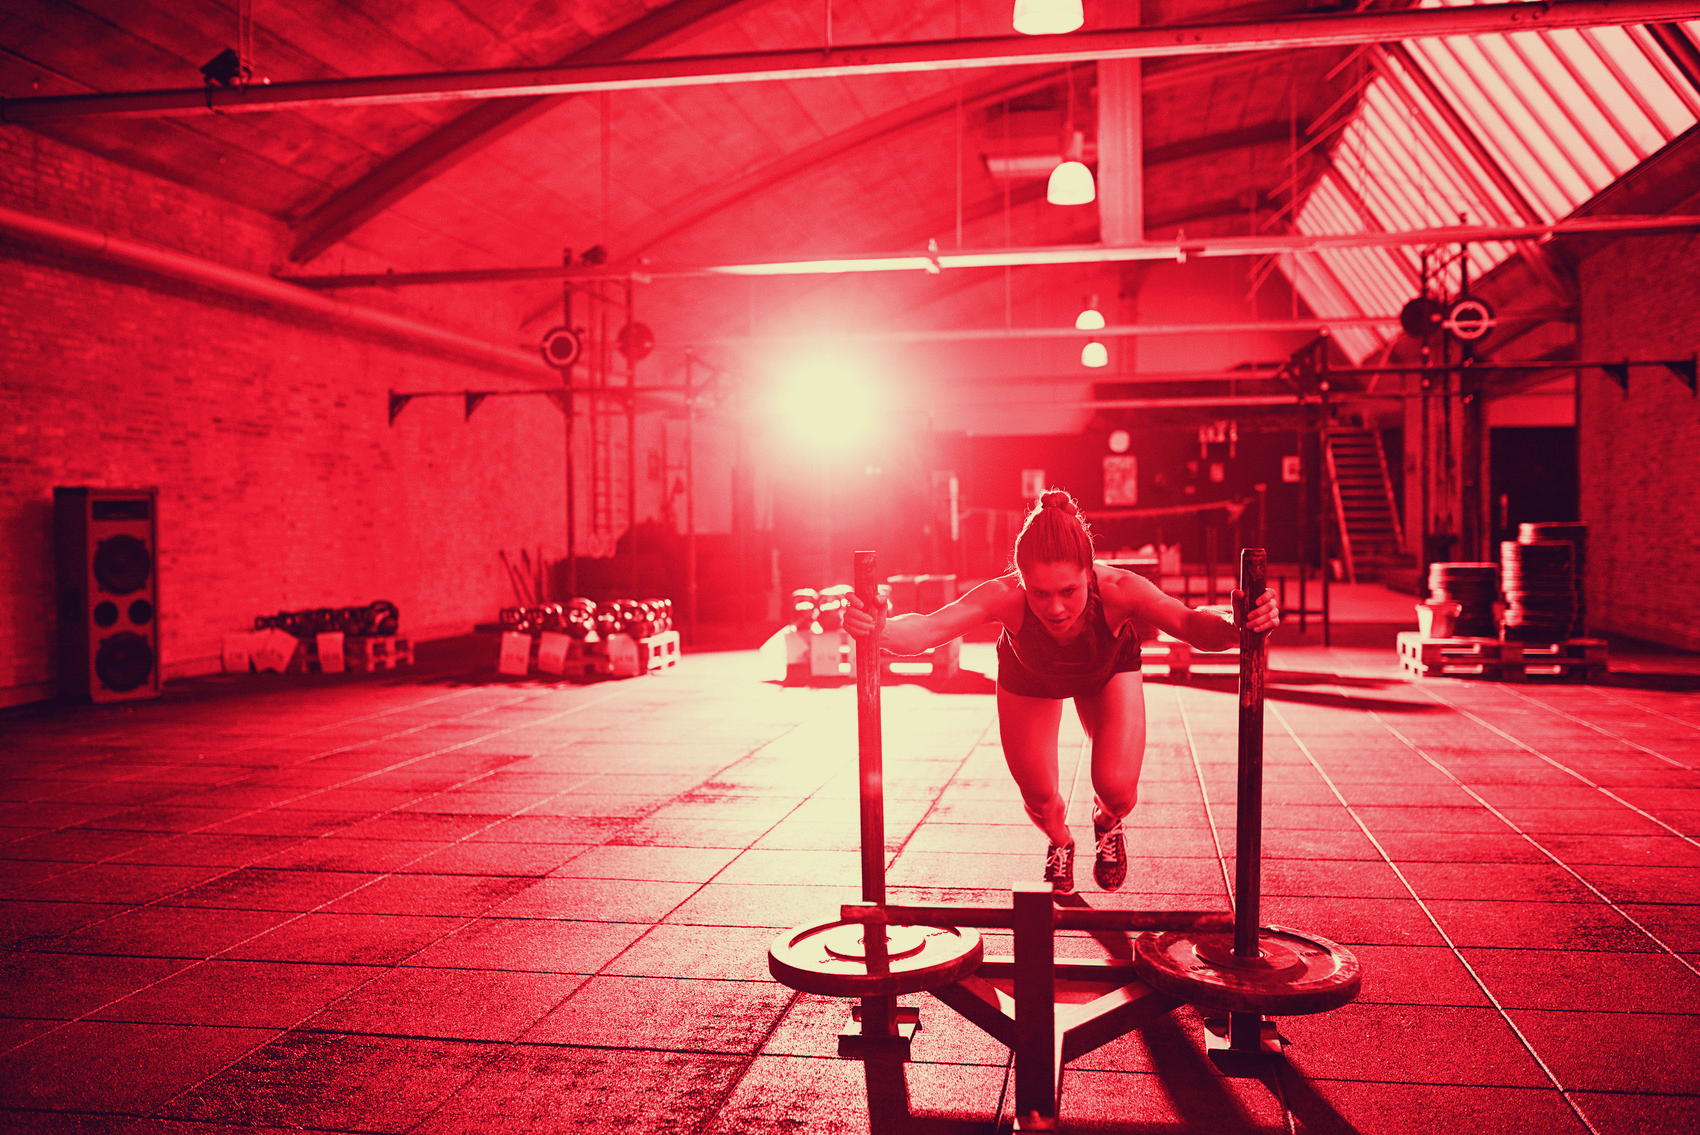 Sports Performance Workout